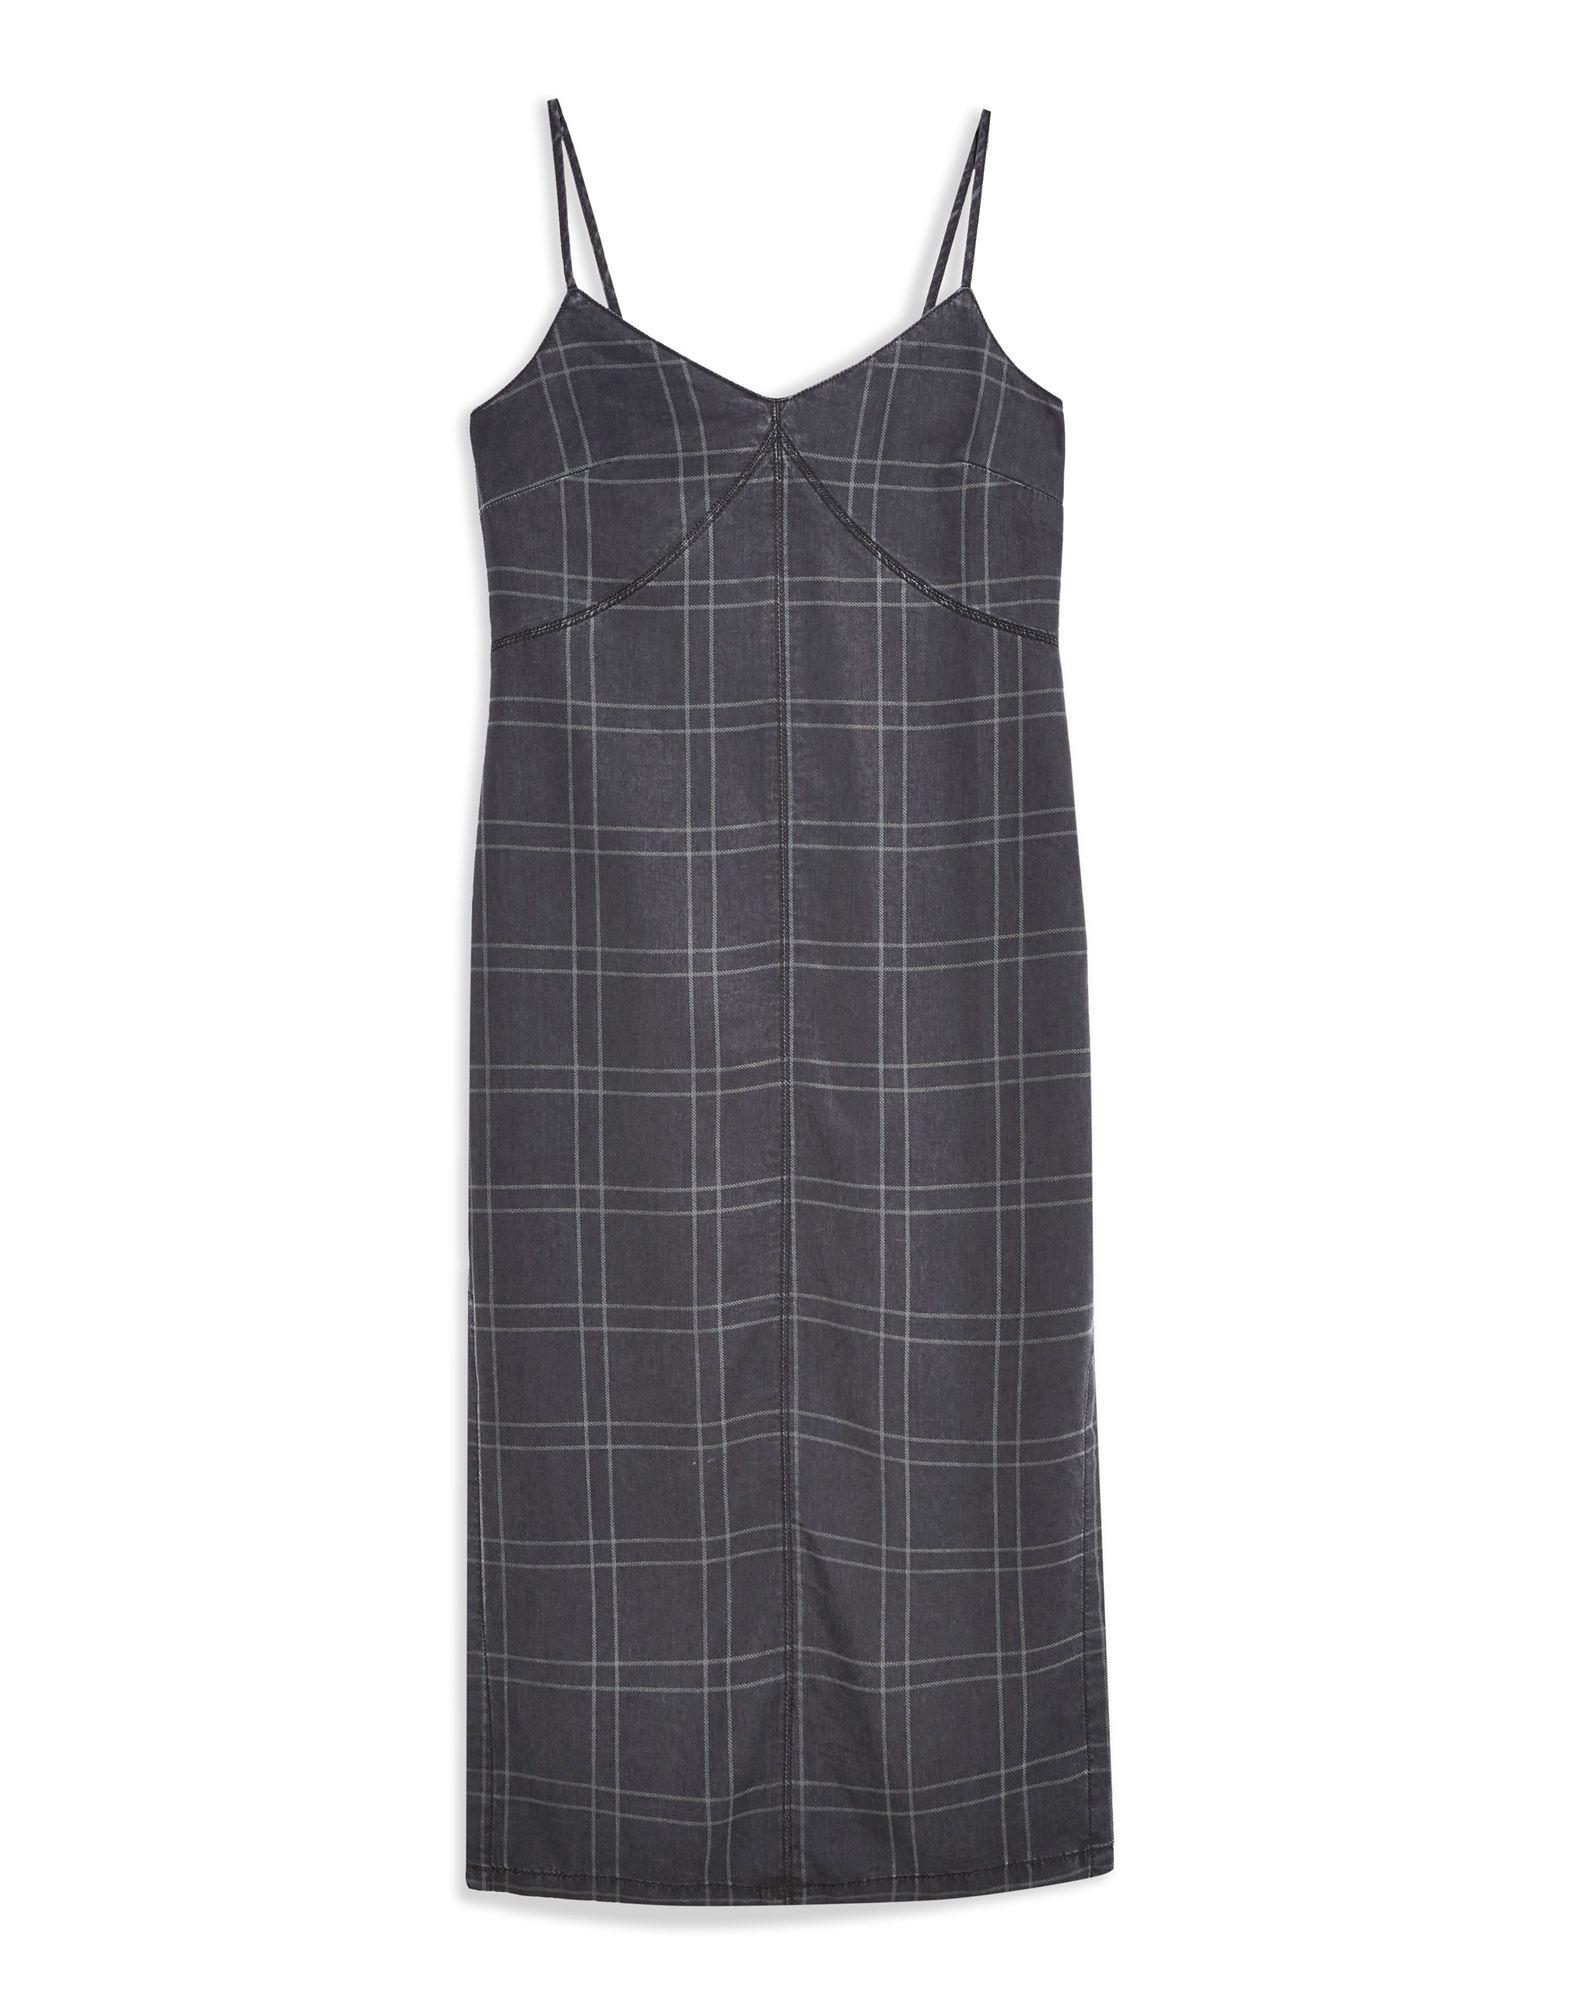 Vestito Longuette Topshop Check Check Check Denim Midi Dress - donna - 34950435FT b75